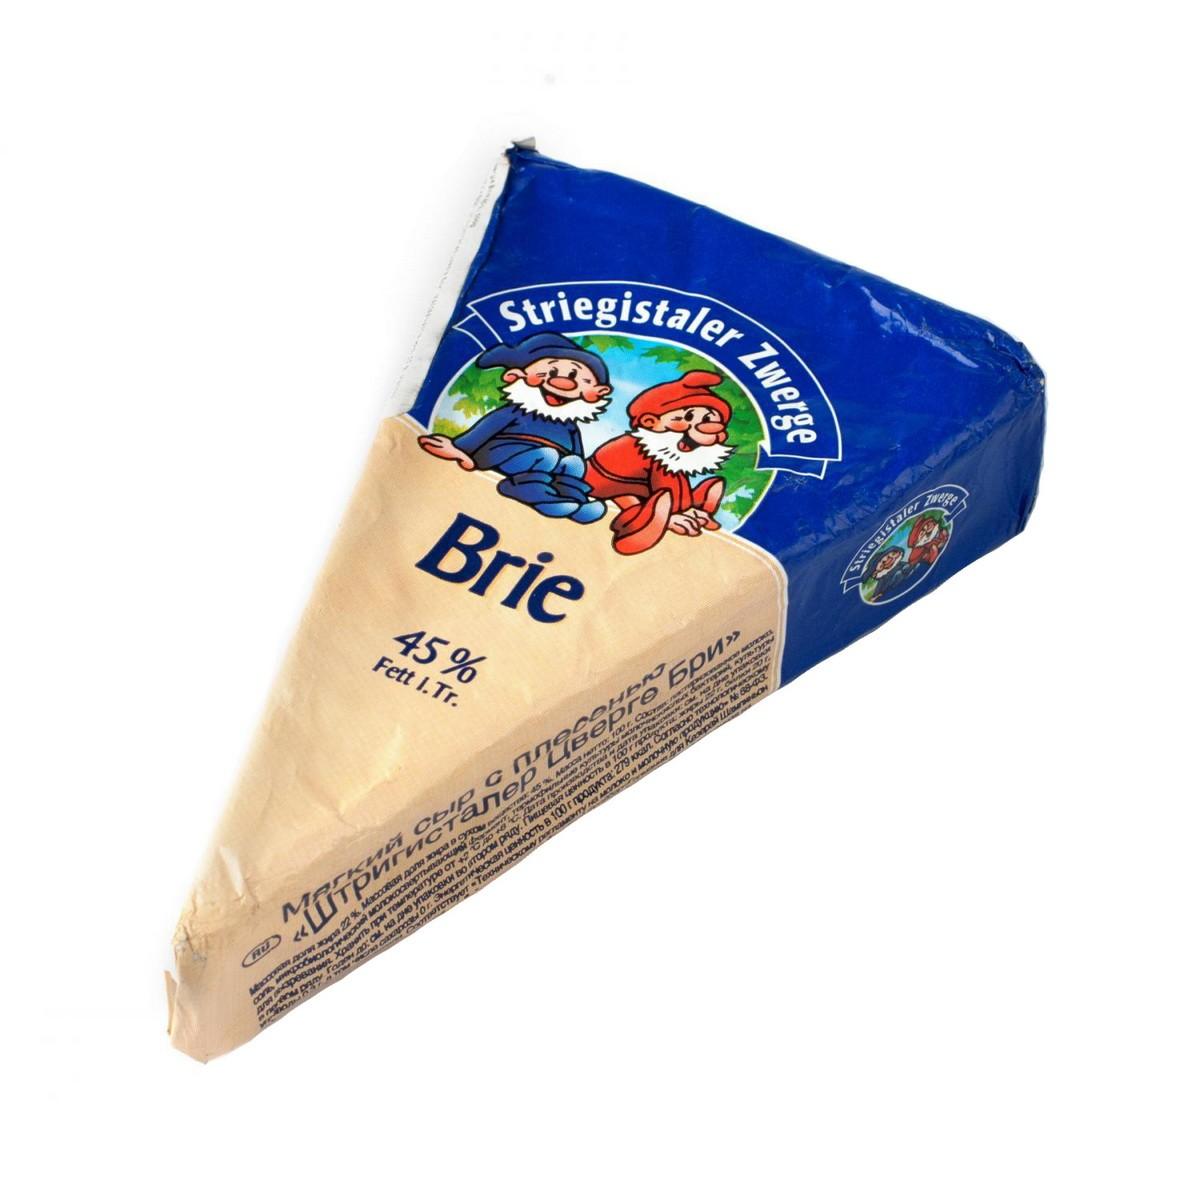 Striegistaler Zwerge Brie фото